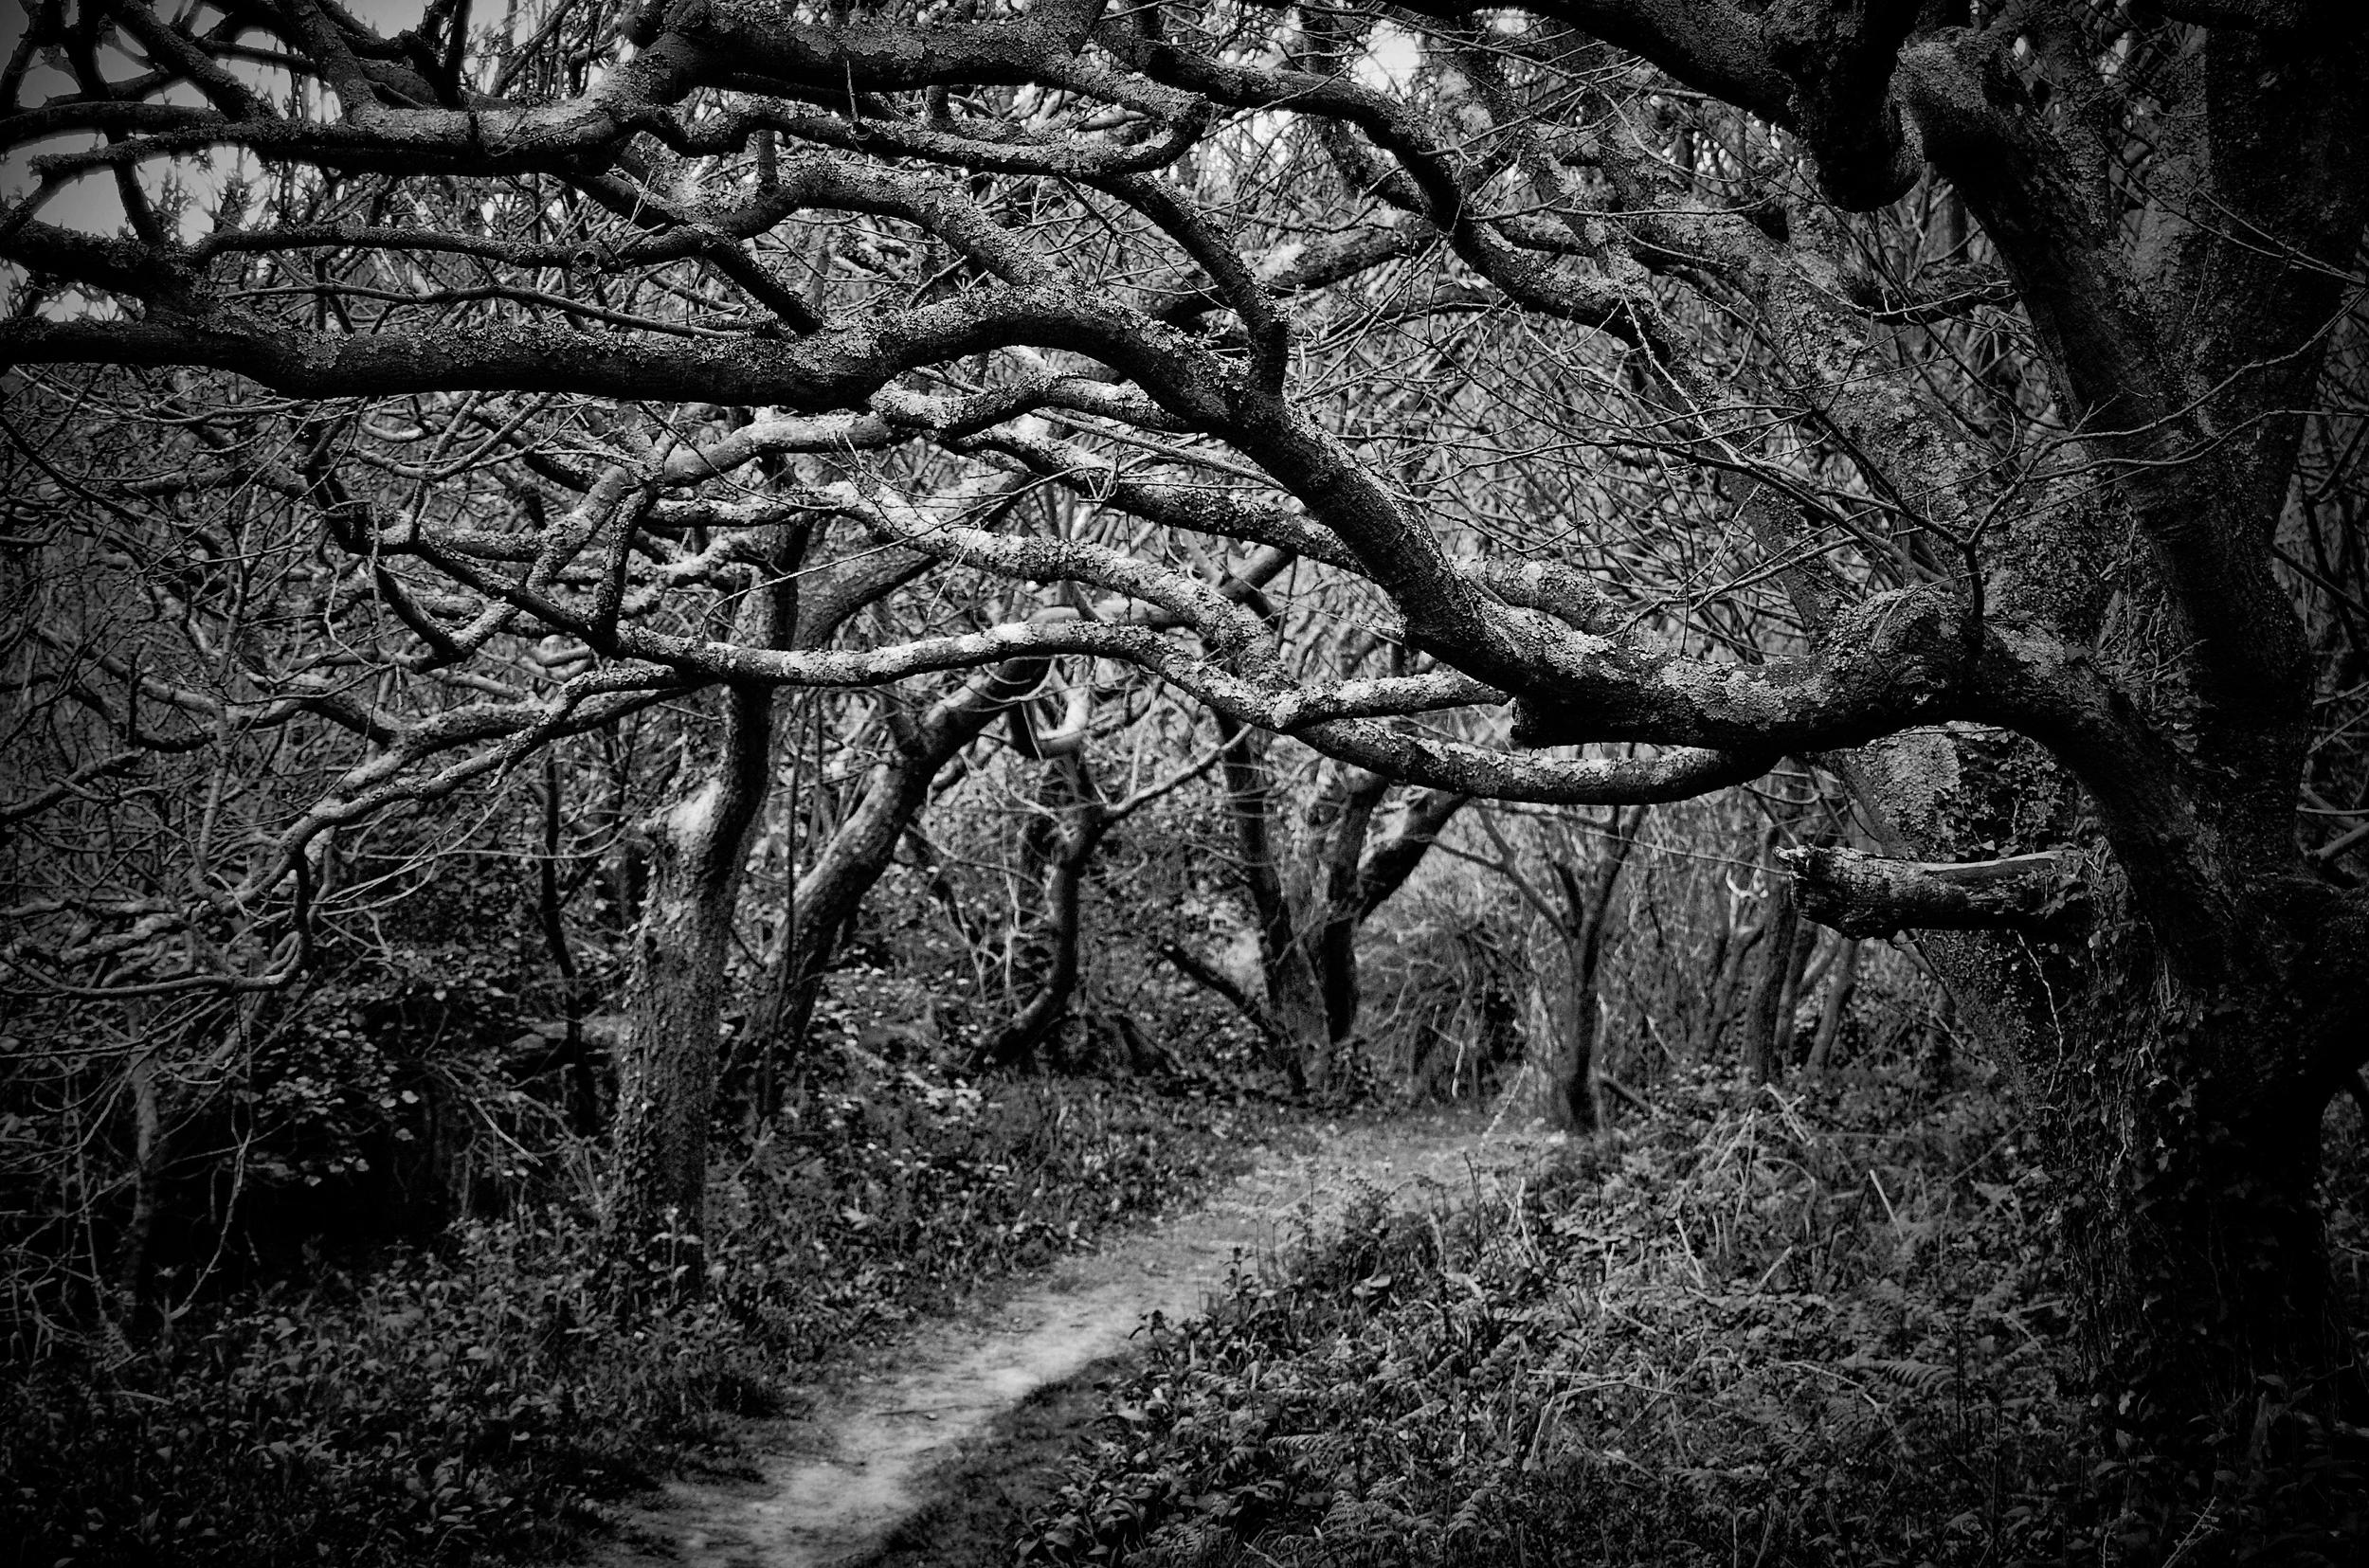 Path  St. Loy, Cornwall, England